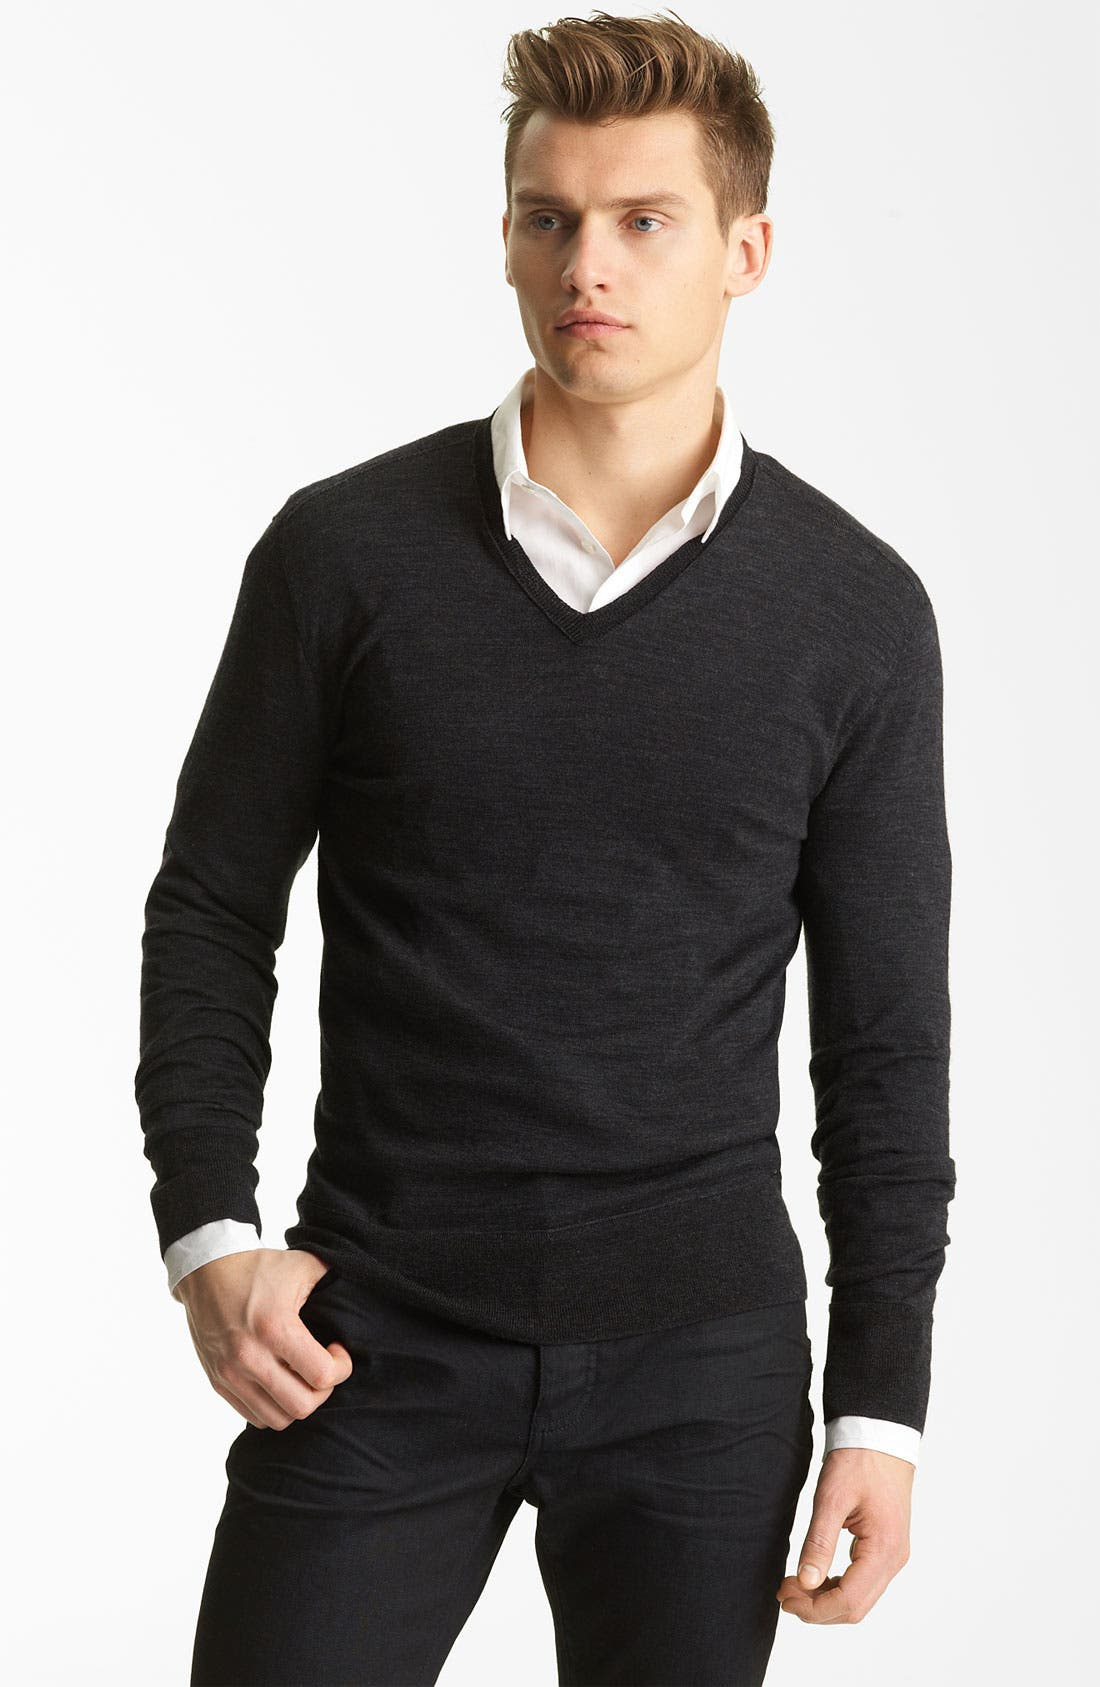 Alternate Image 1 Selected - John Varvatos Collection V-Neck Wool Knit Sweater